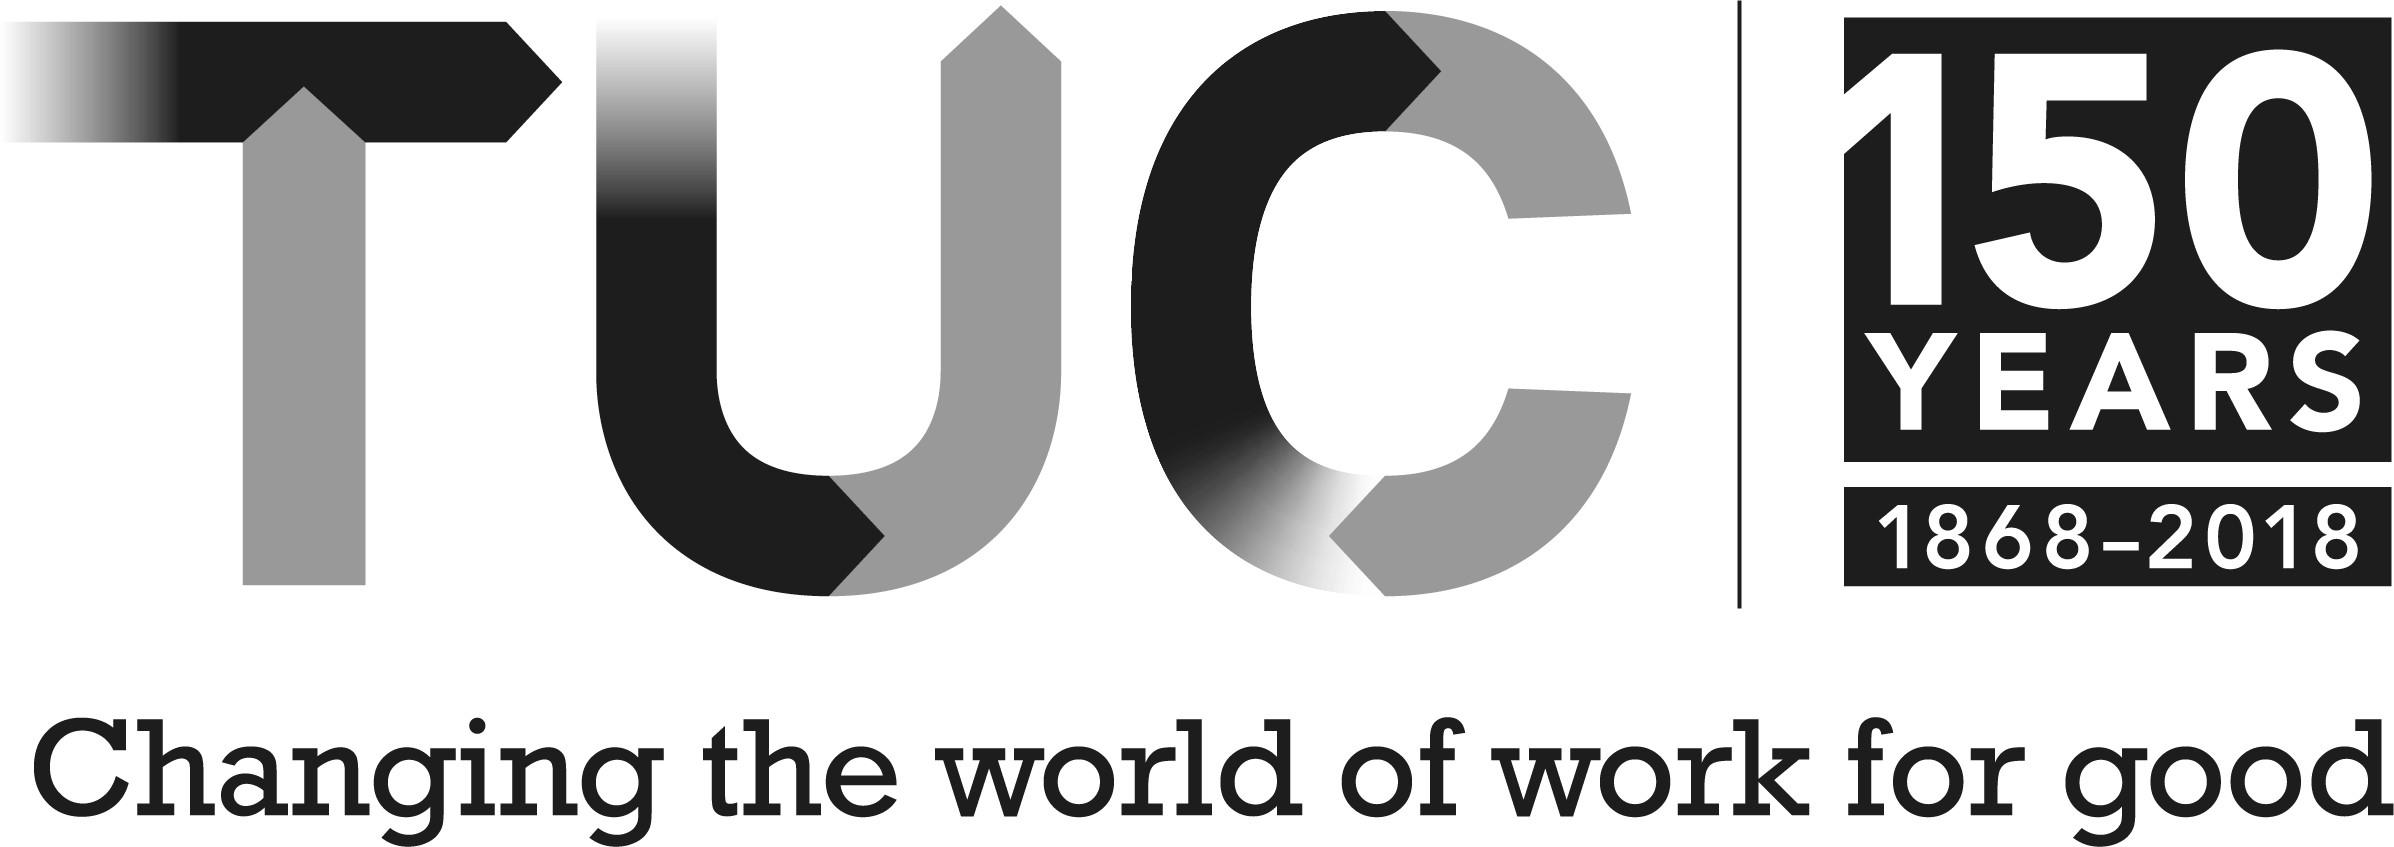 TUC 150th logo